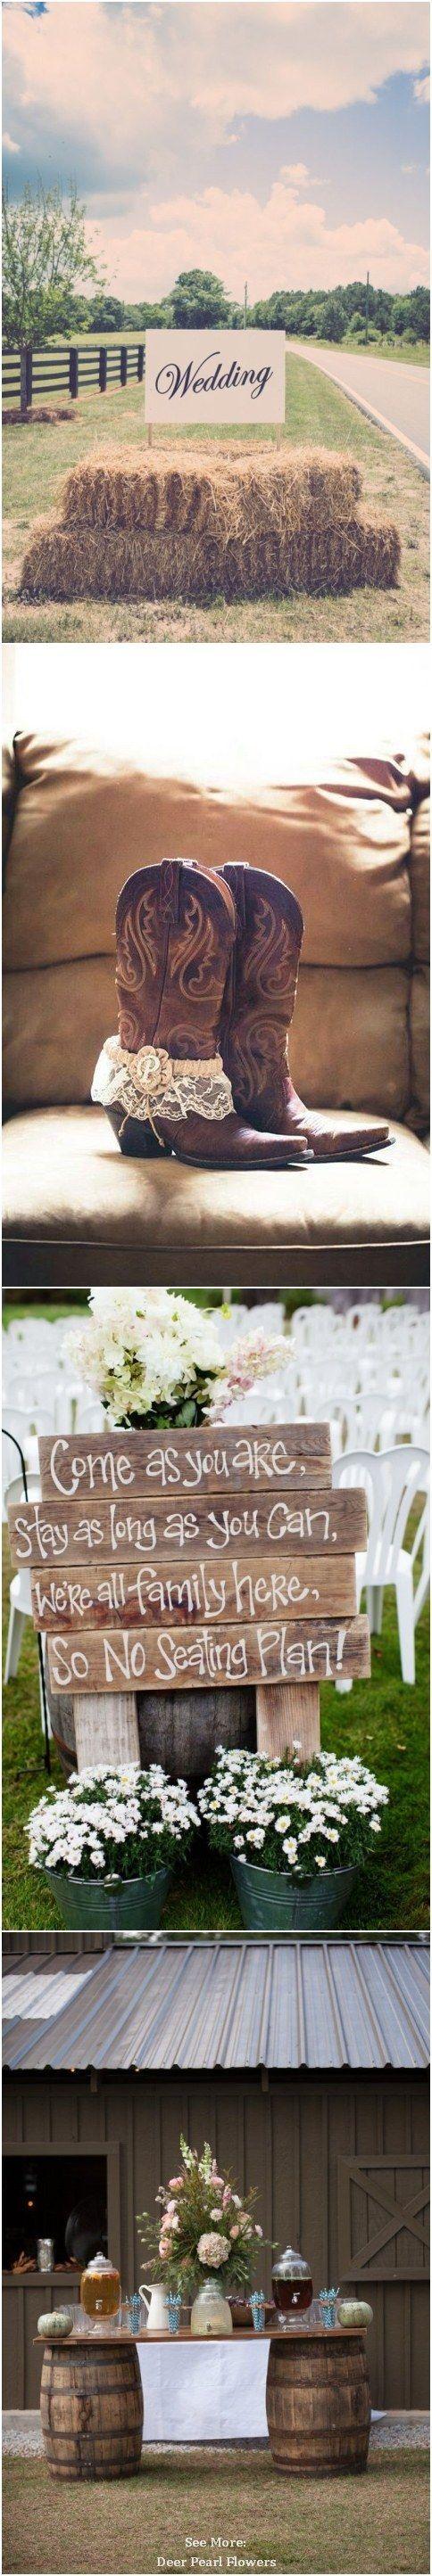 best wedding ideas images on Pinterest  Wedding ideas Bridal